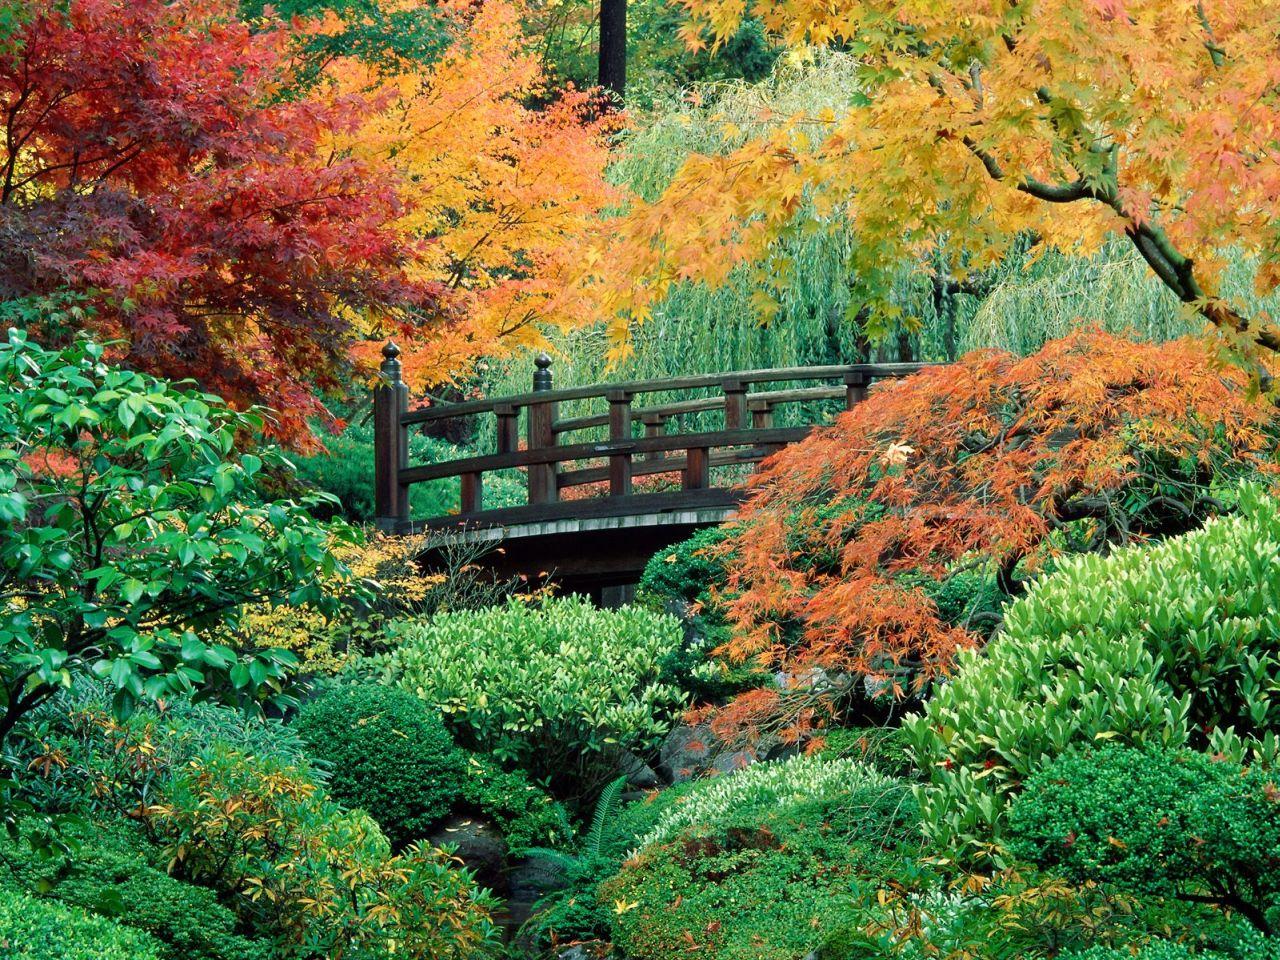 Download Autumn Scene wallpaper Autumn scene 7 1280x960